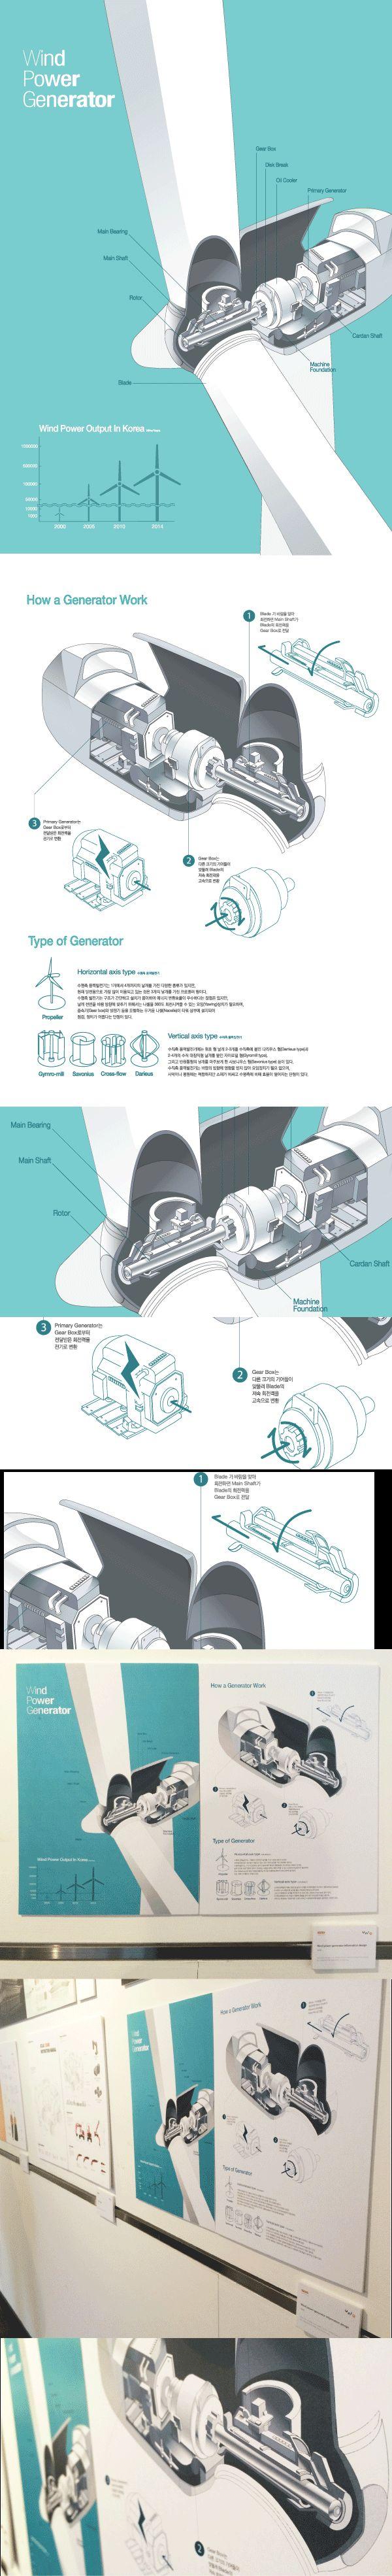 Wind Power Generator Information Design by Jee-Eun Seo